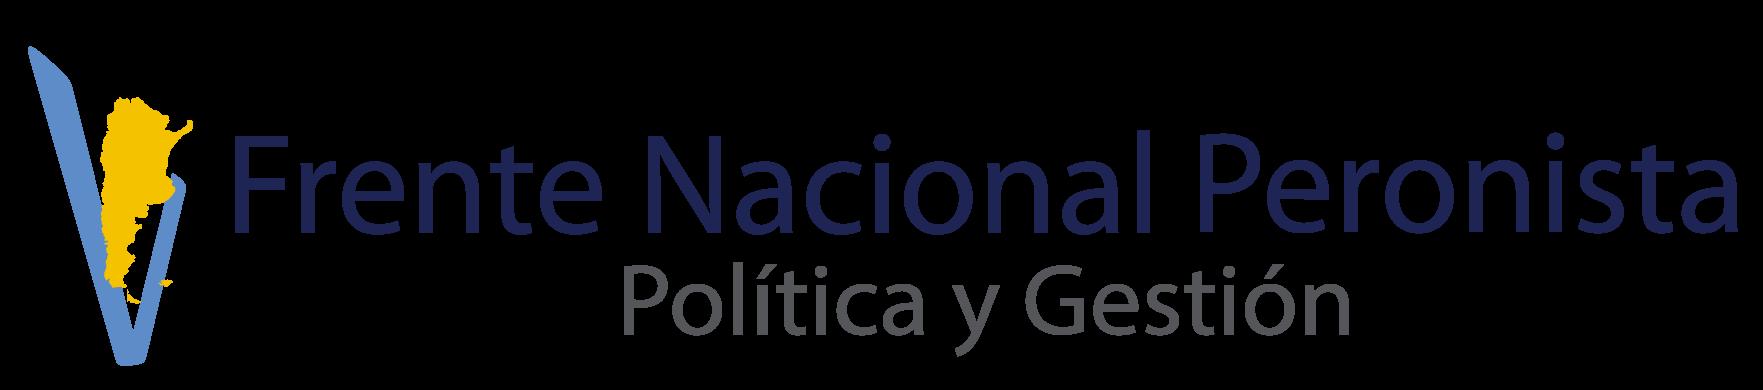 Frente Nacional Peronista